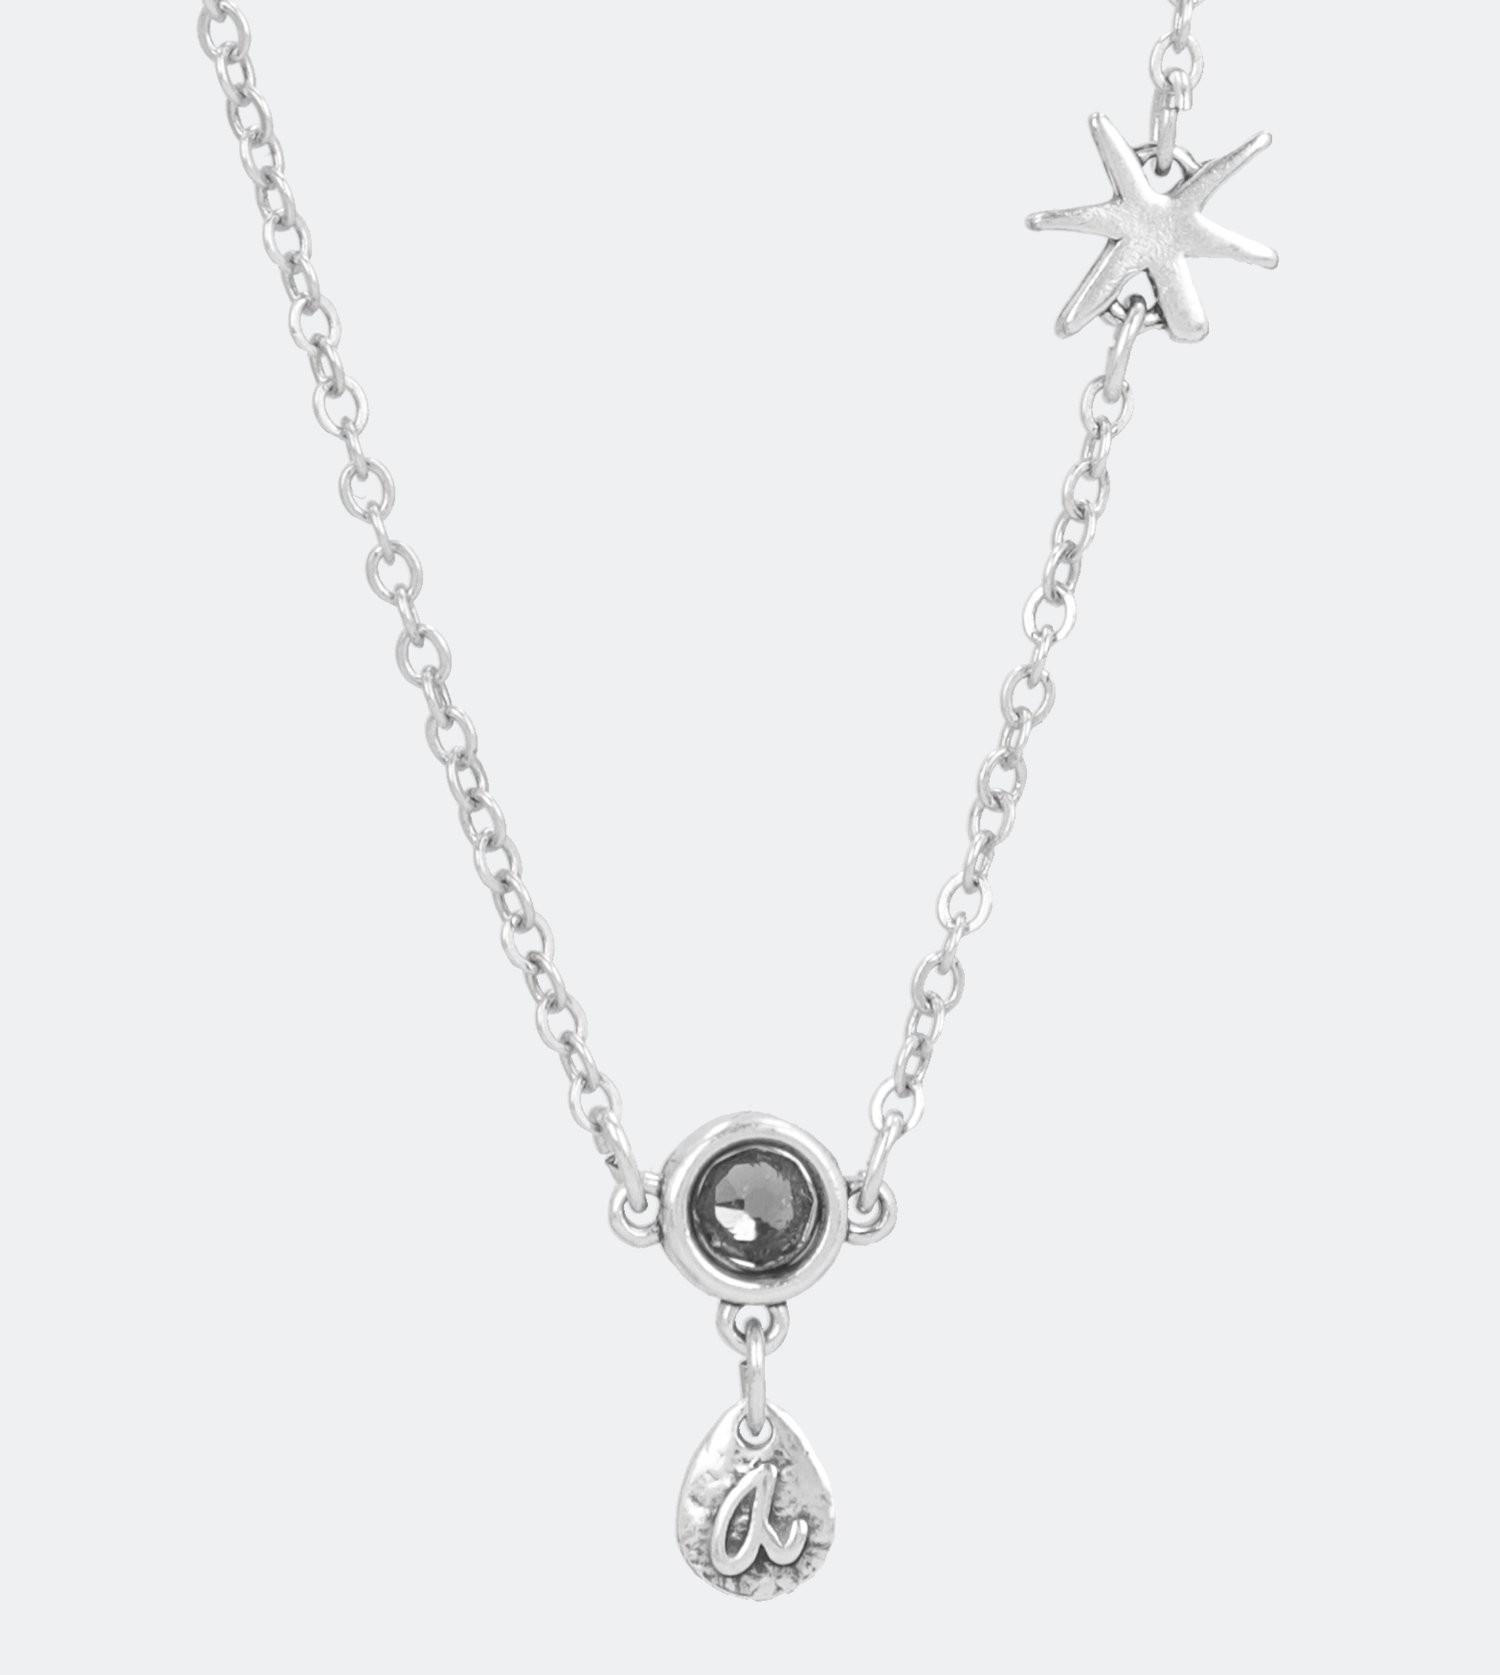 Anekke Jewelery 31702-26-005SIL